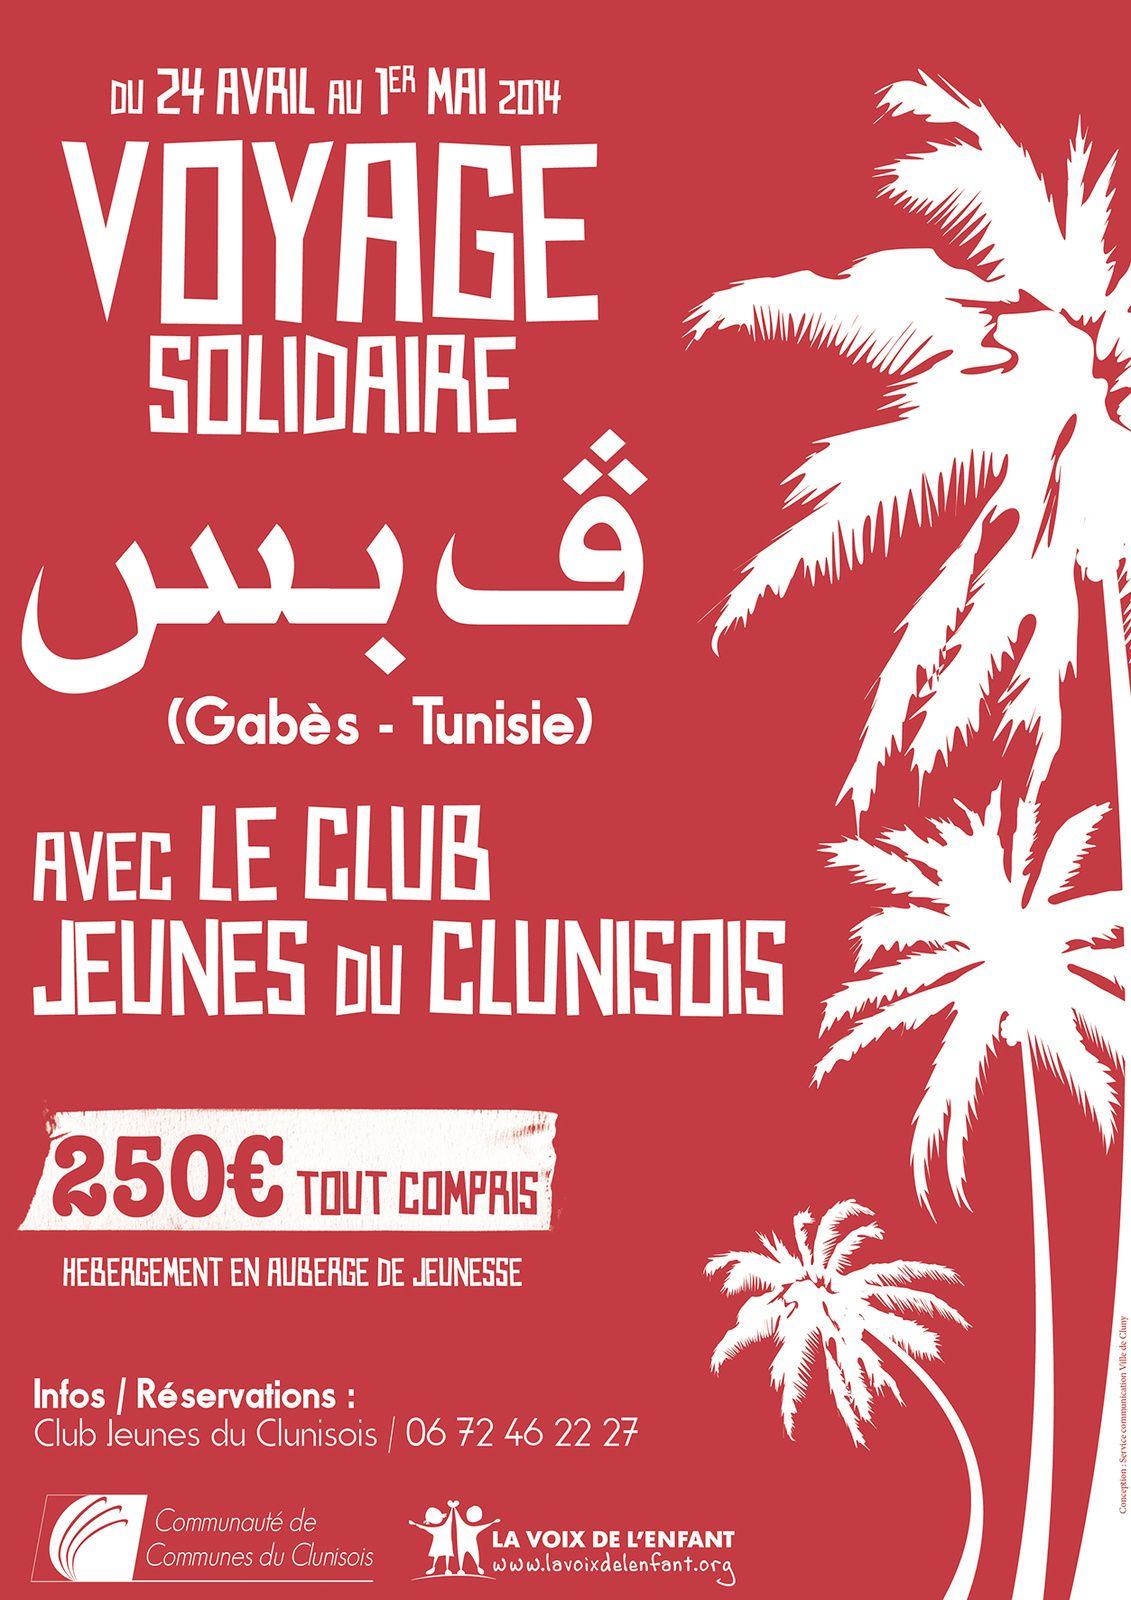 Voyage Solidaire en Tunisie du 24 avril au 1er mai